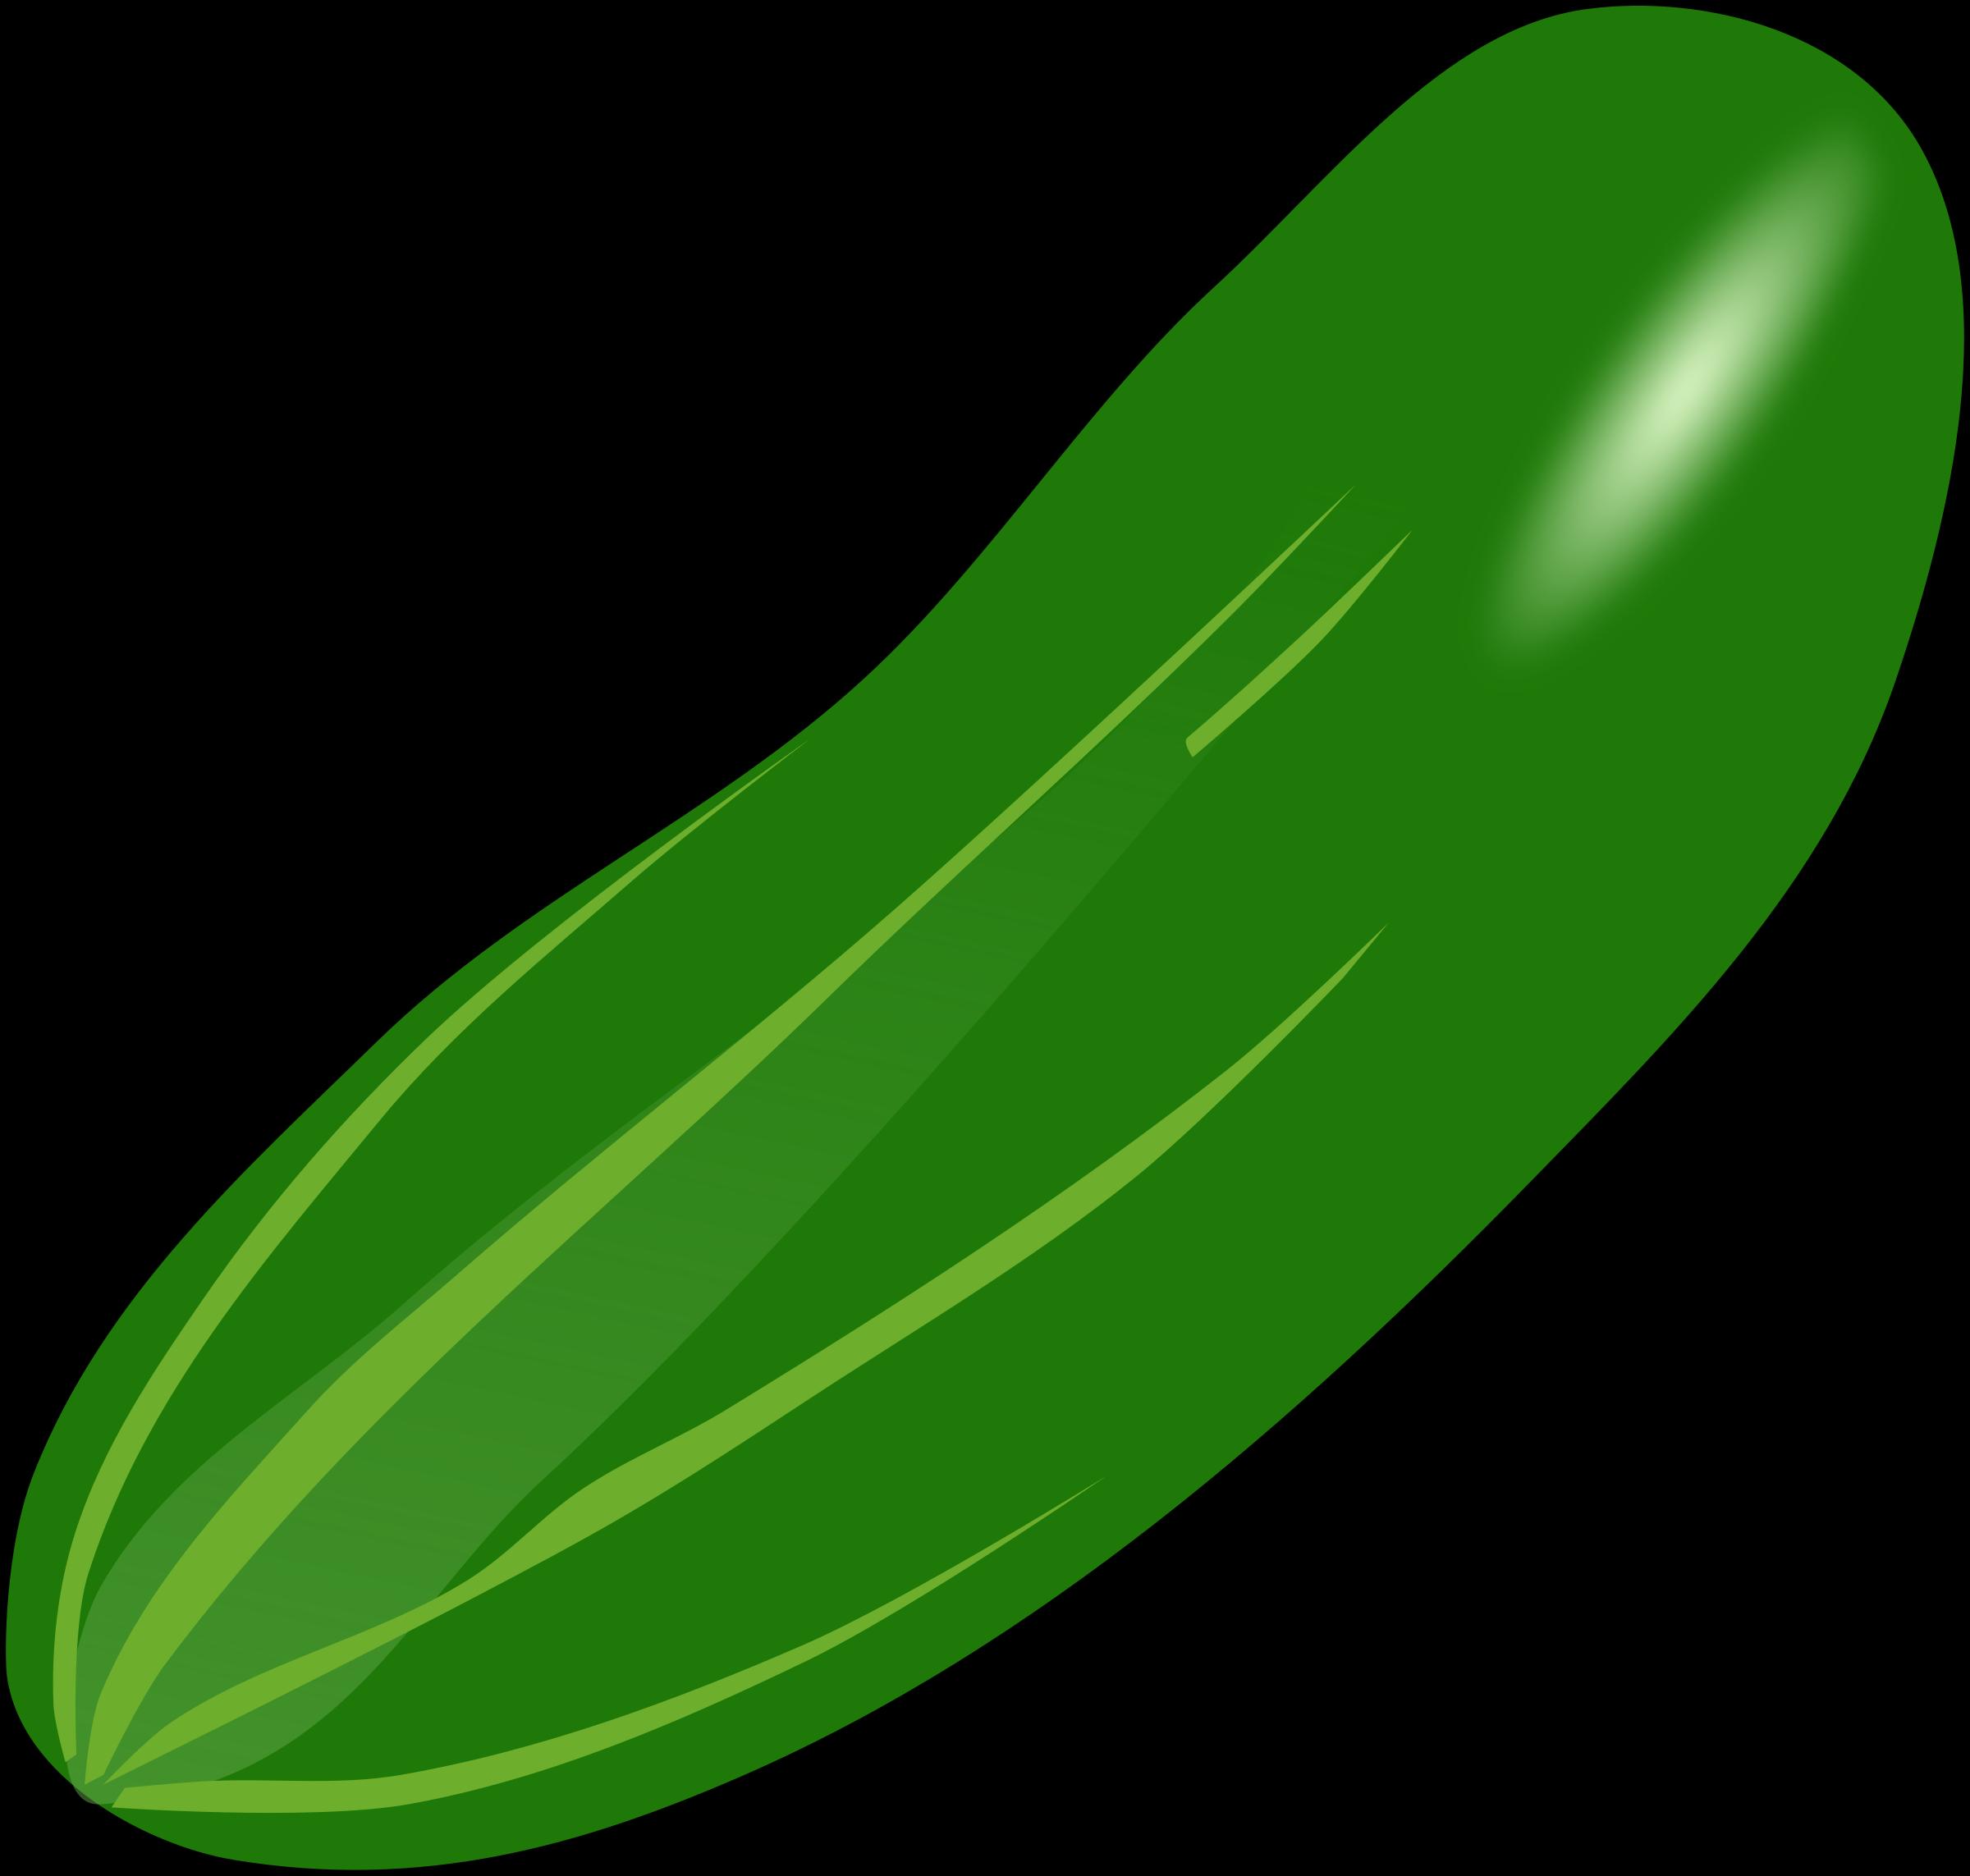 Zucchini clipart pipino. Bean cucumber pencil and